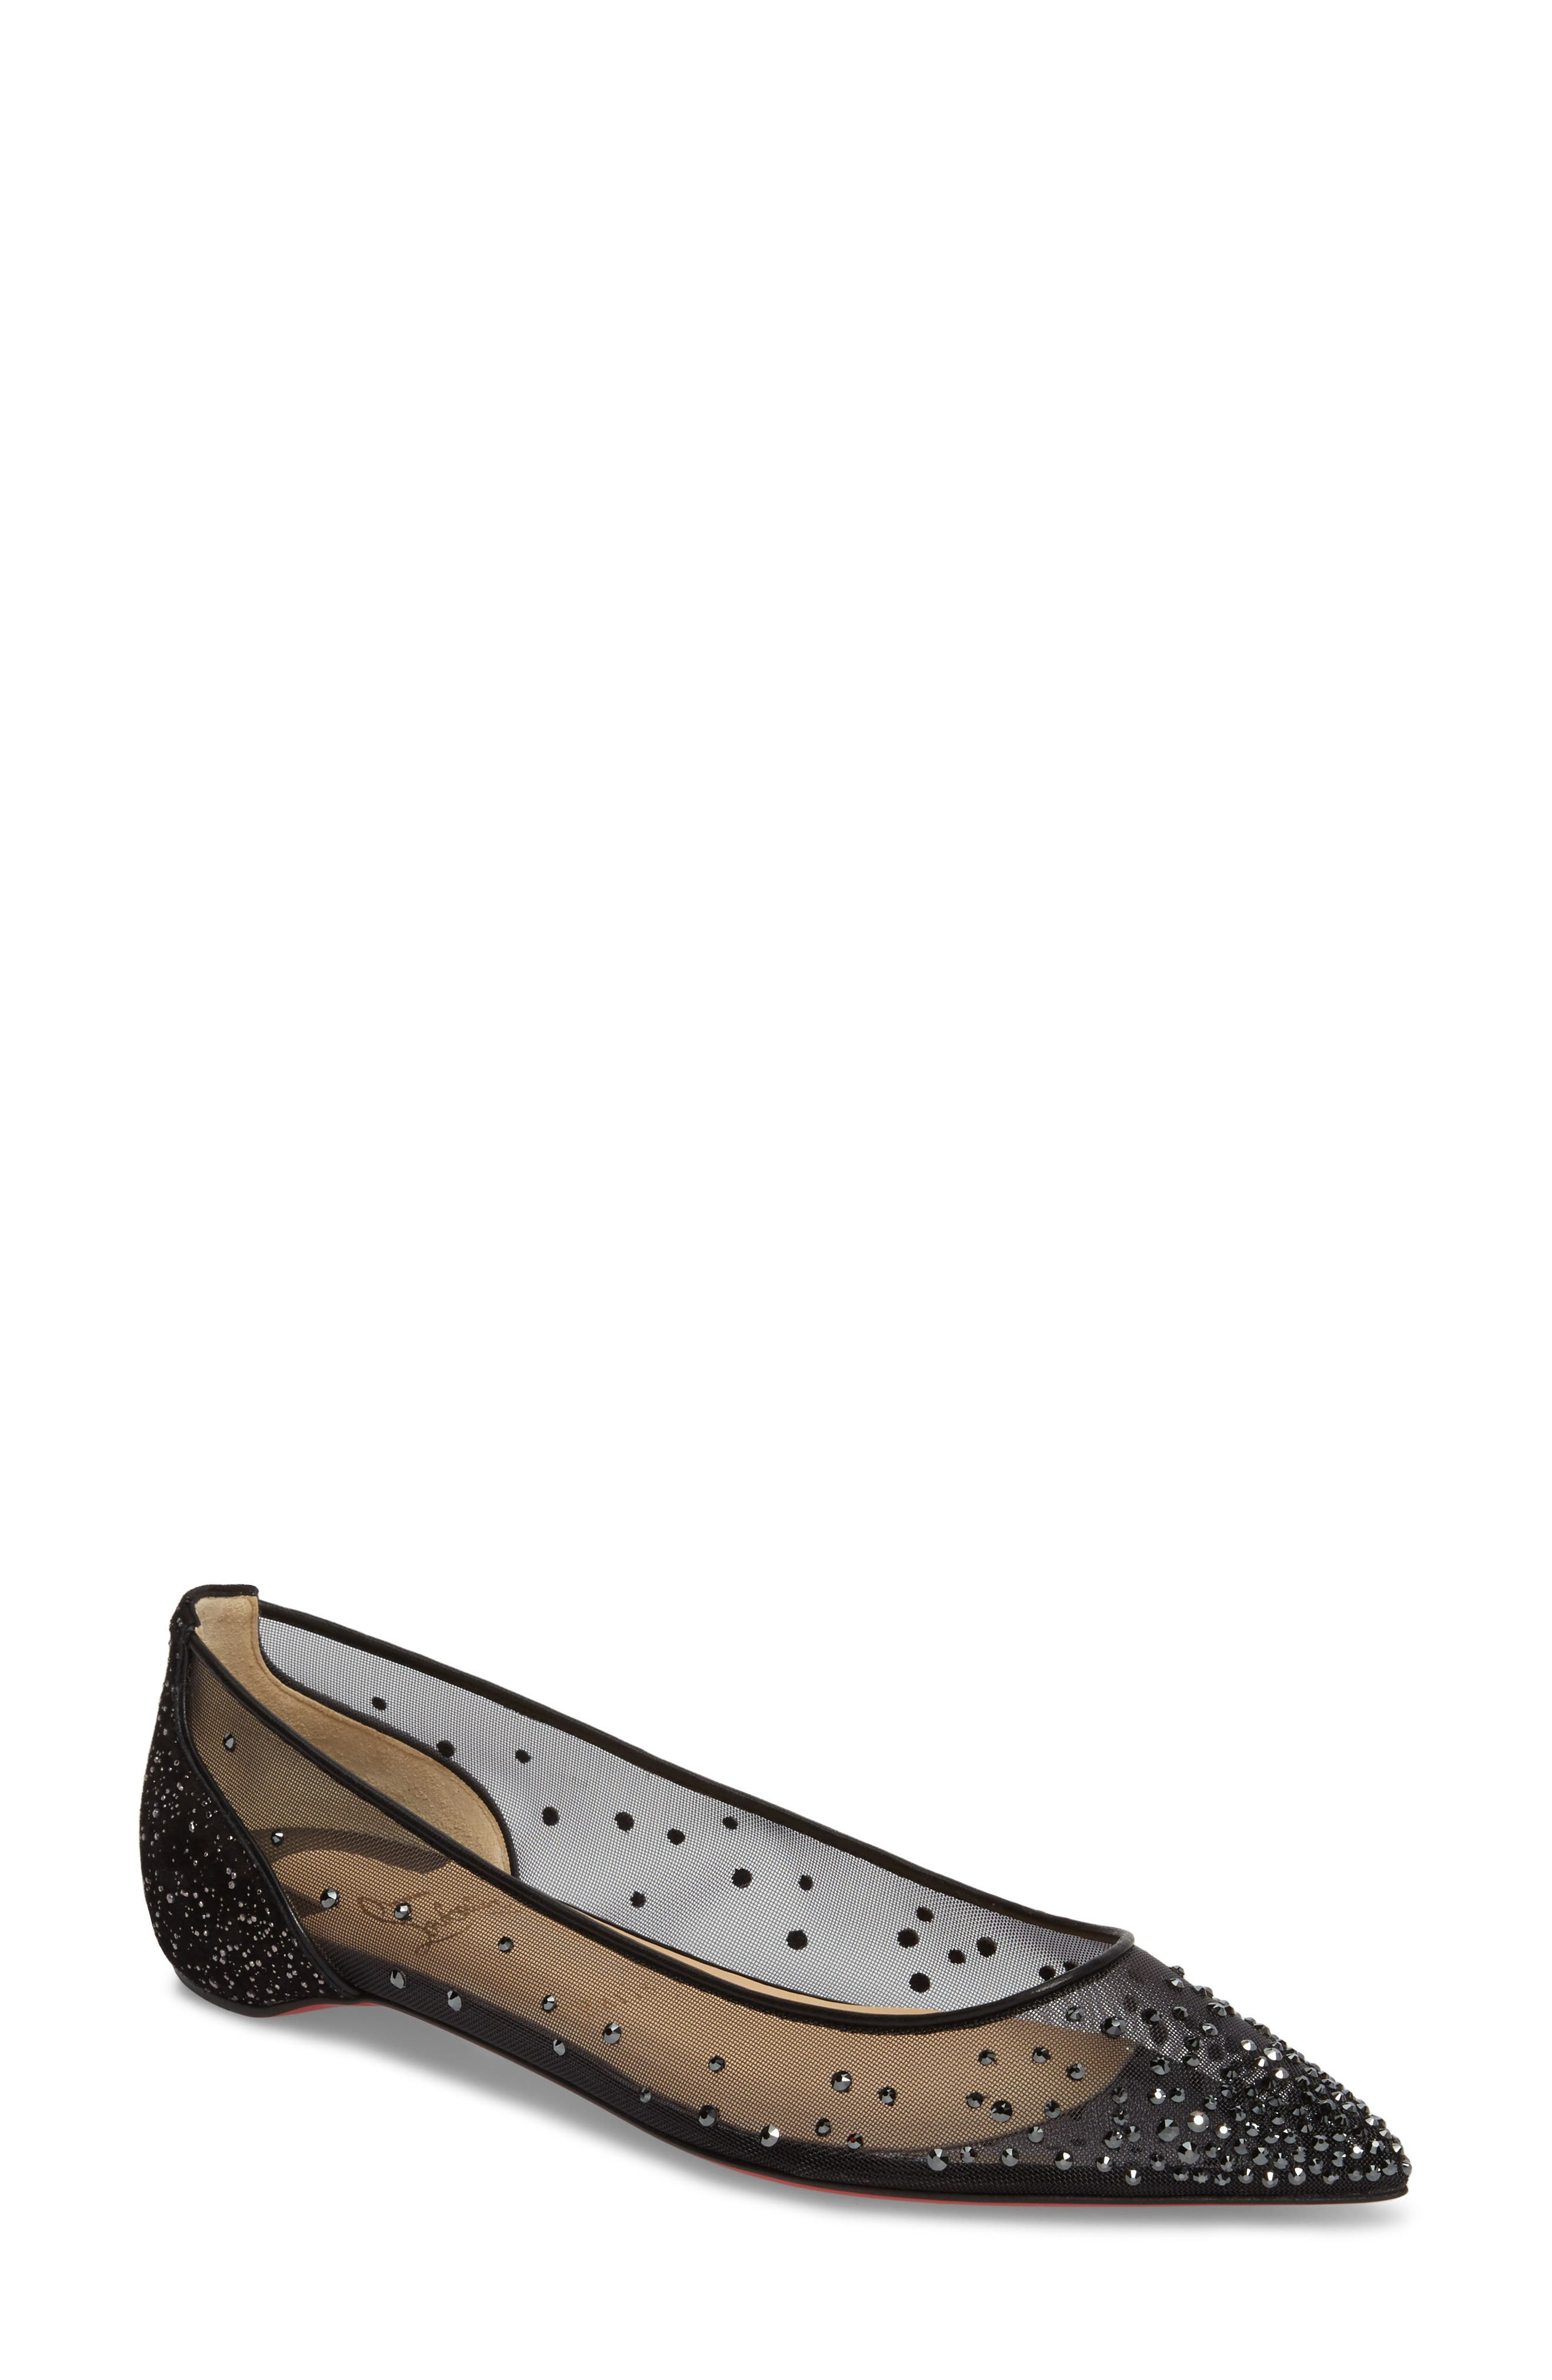 Christian Louboutin Follies Strass Crystal Embellished Flat (Women)